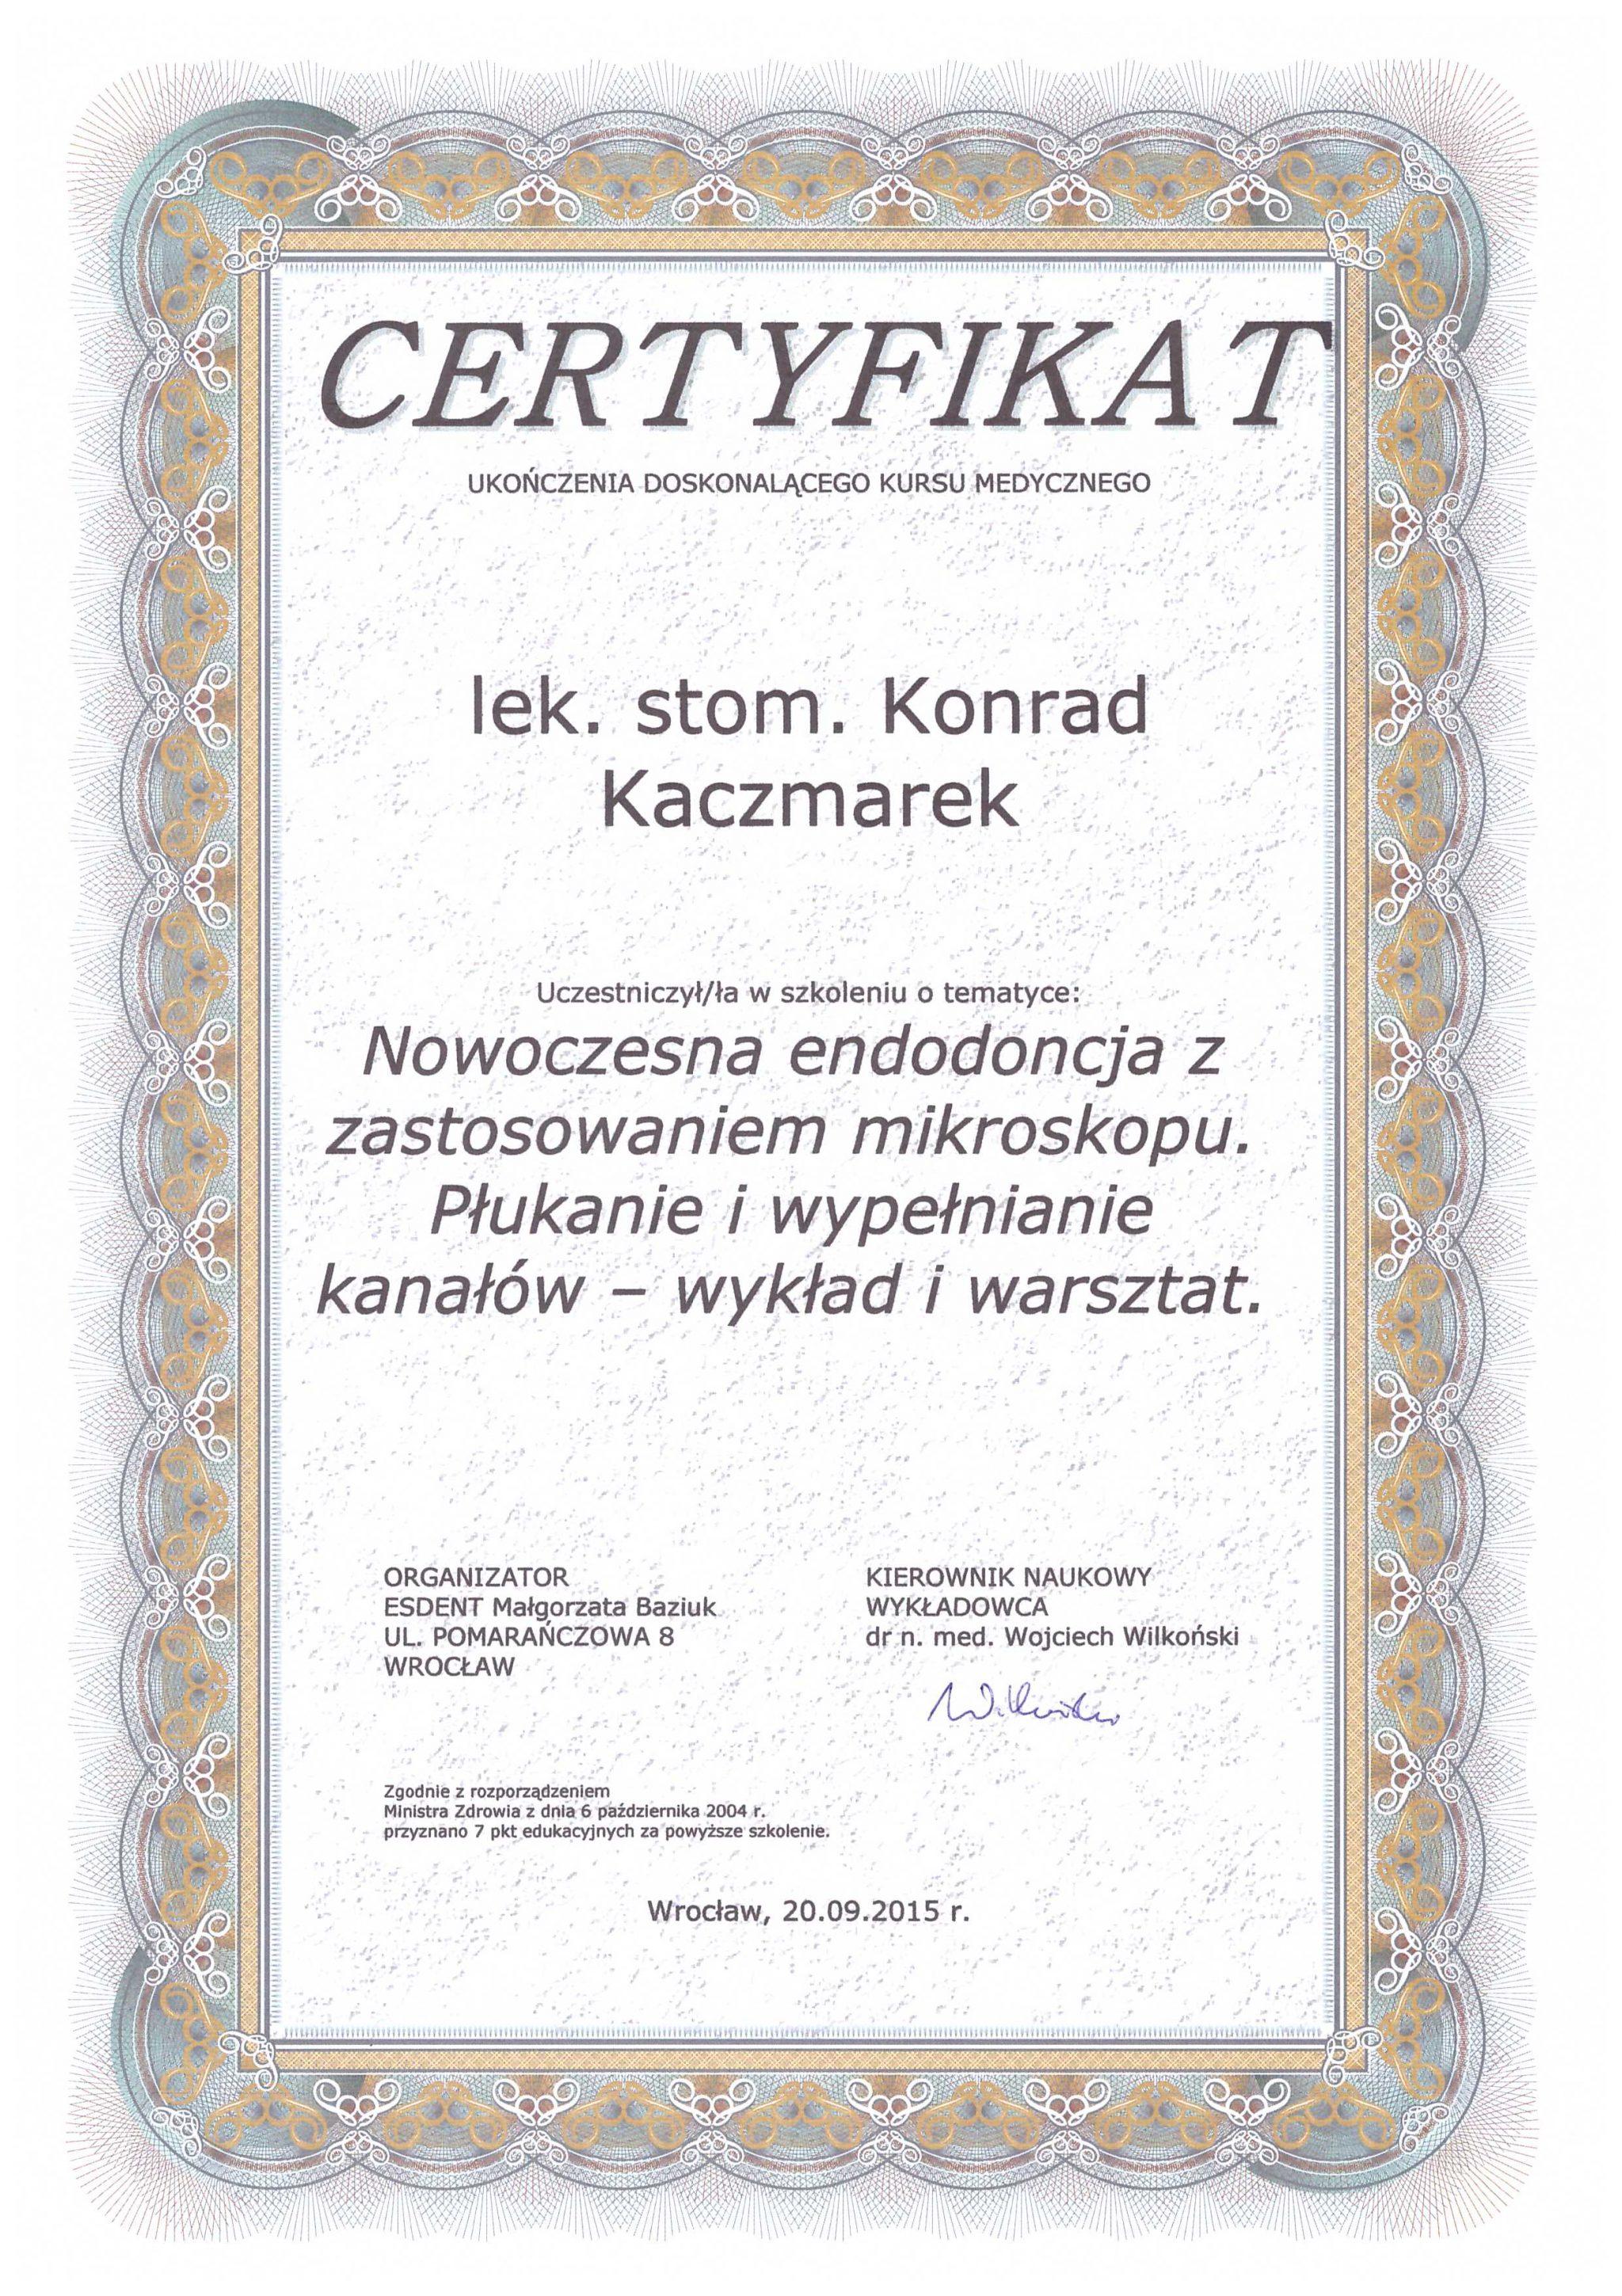 Certyfikaty Konrad Kaczmarek